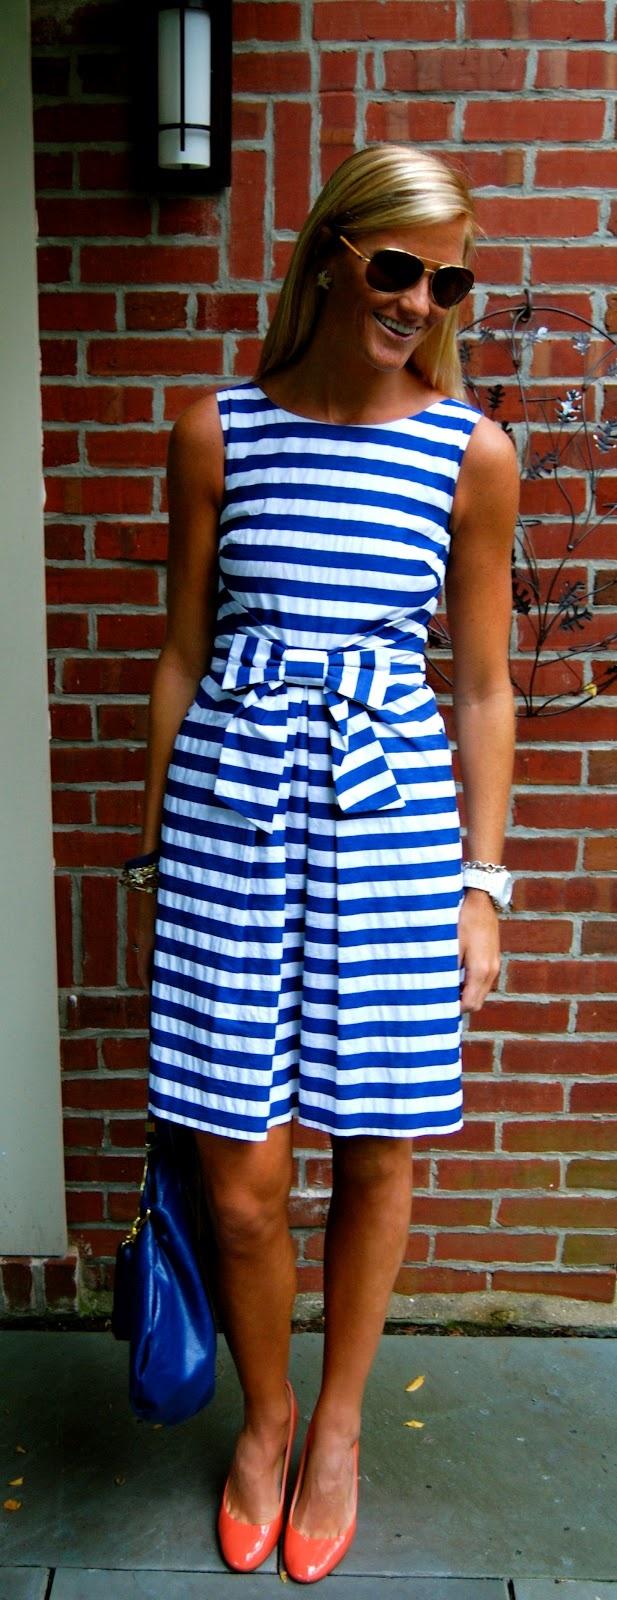 I want this dress so bad!!